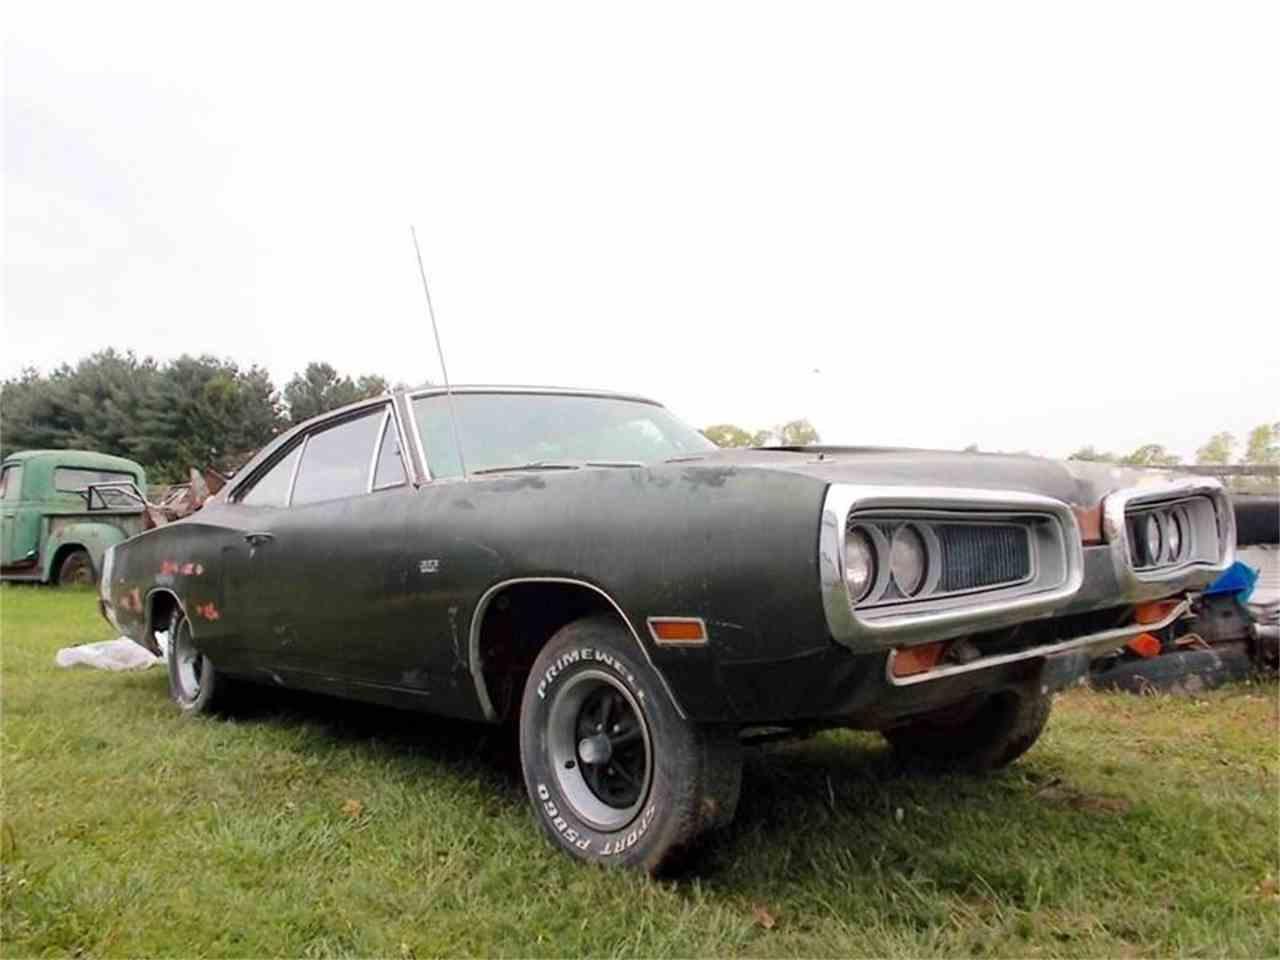 1970 Dodge Super Bee For Sale Classiccars Com Cc 983529